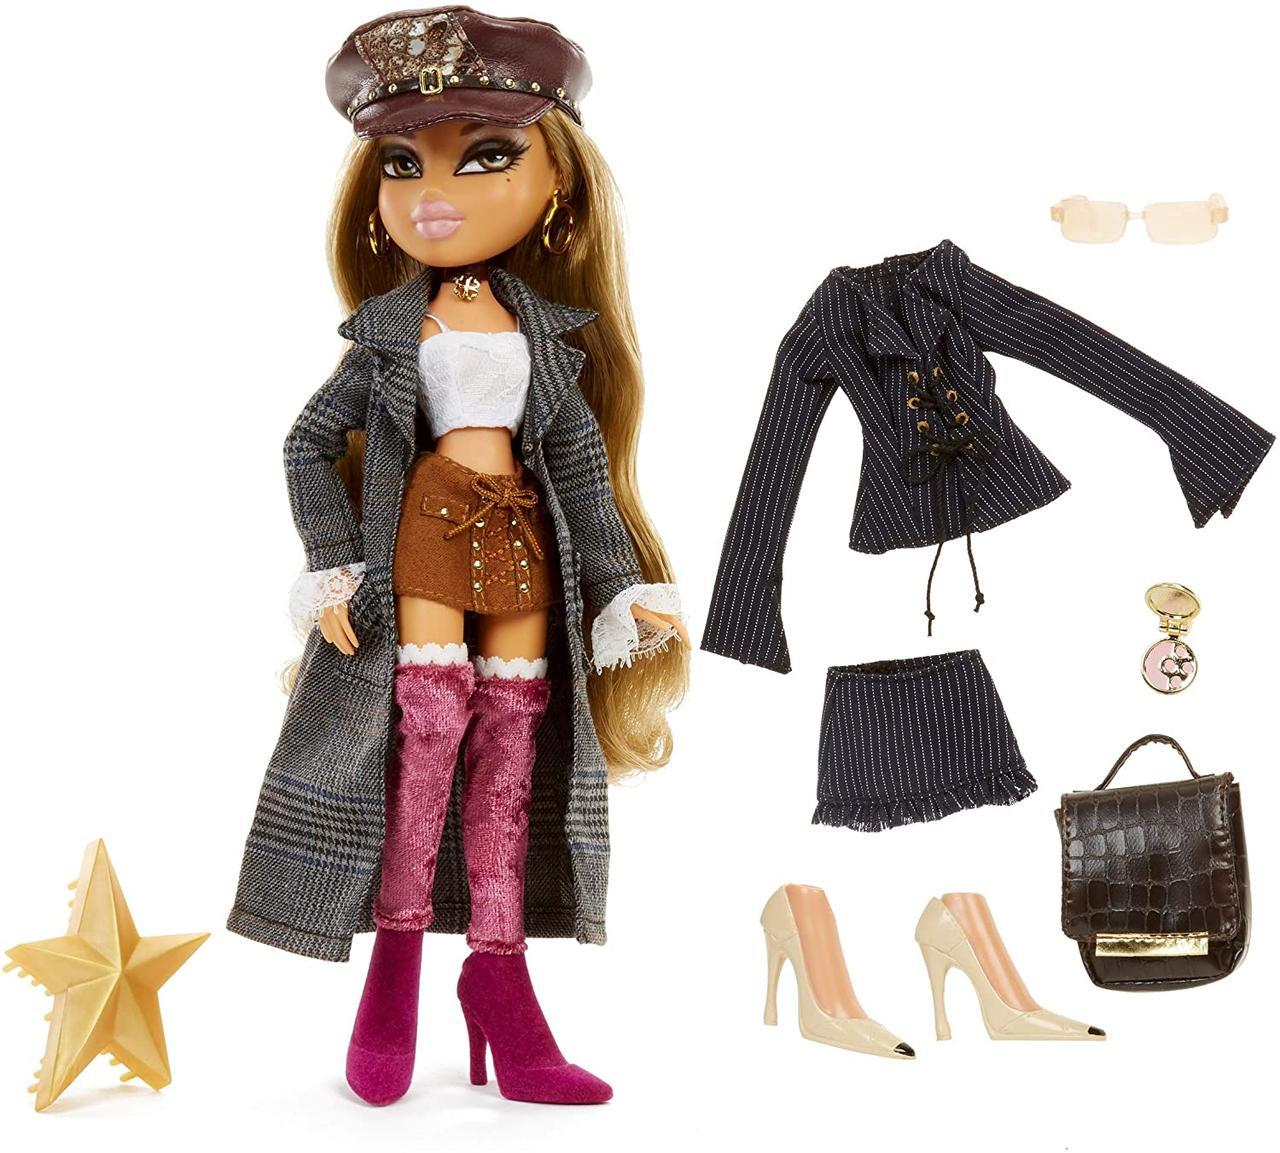 Кукла Братц Ясмин Жасмин коллектор Yasmin Bratz Collector Doll коллекционная 2018 года оригинал